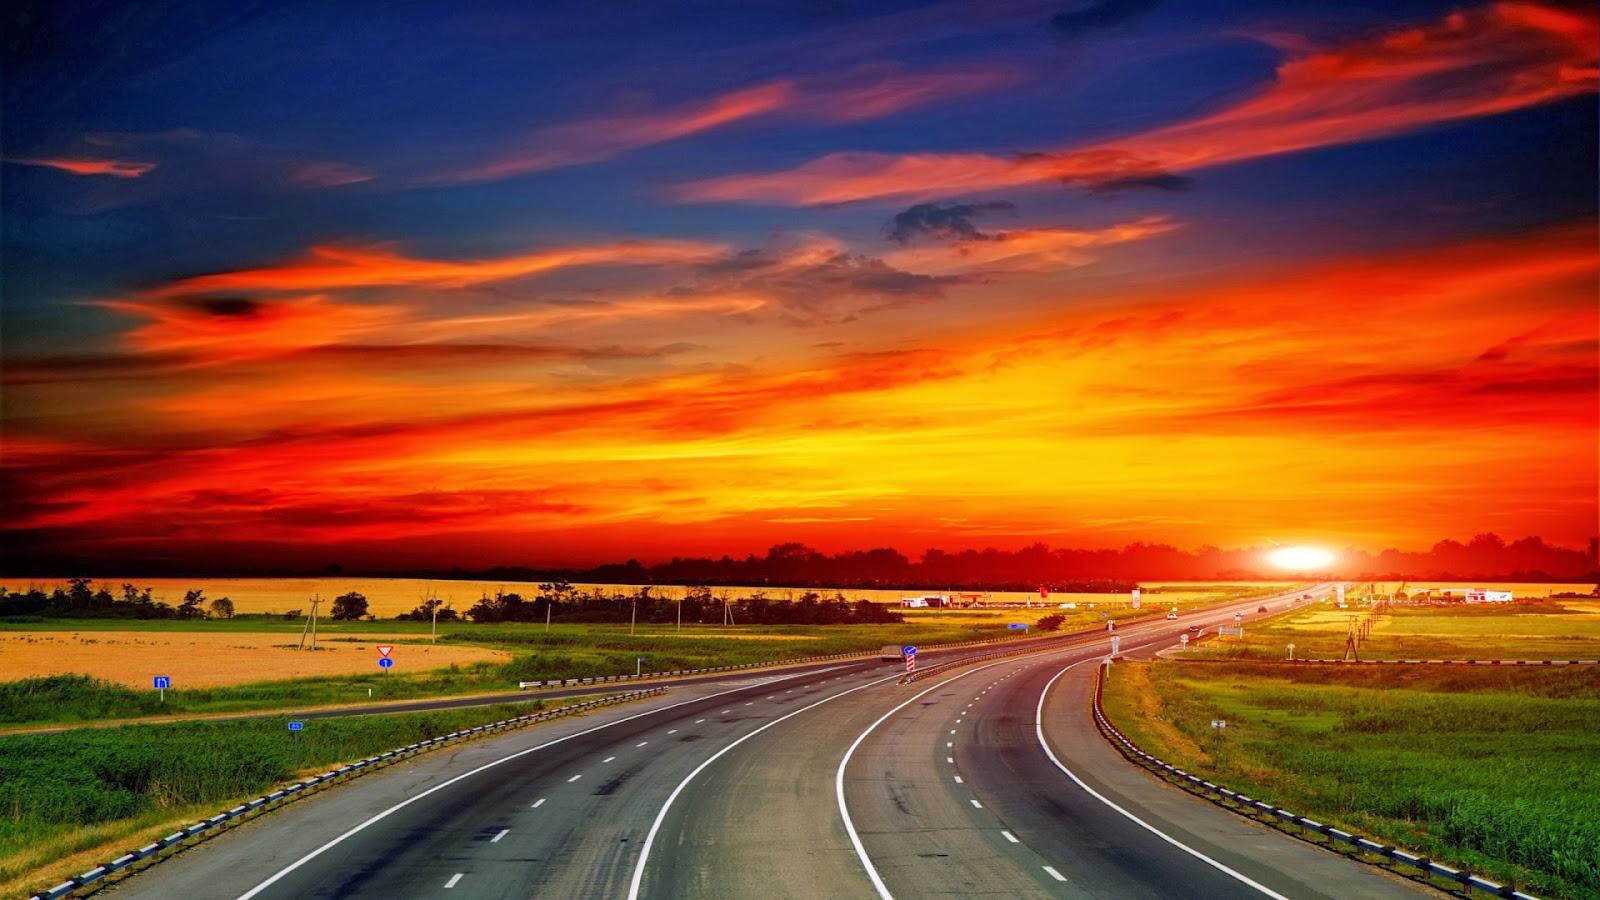 Wallpaper Pemandangan Sunset Hd Stok Wallpaper